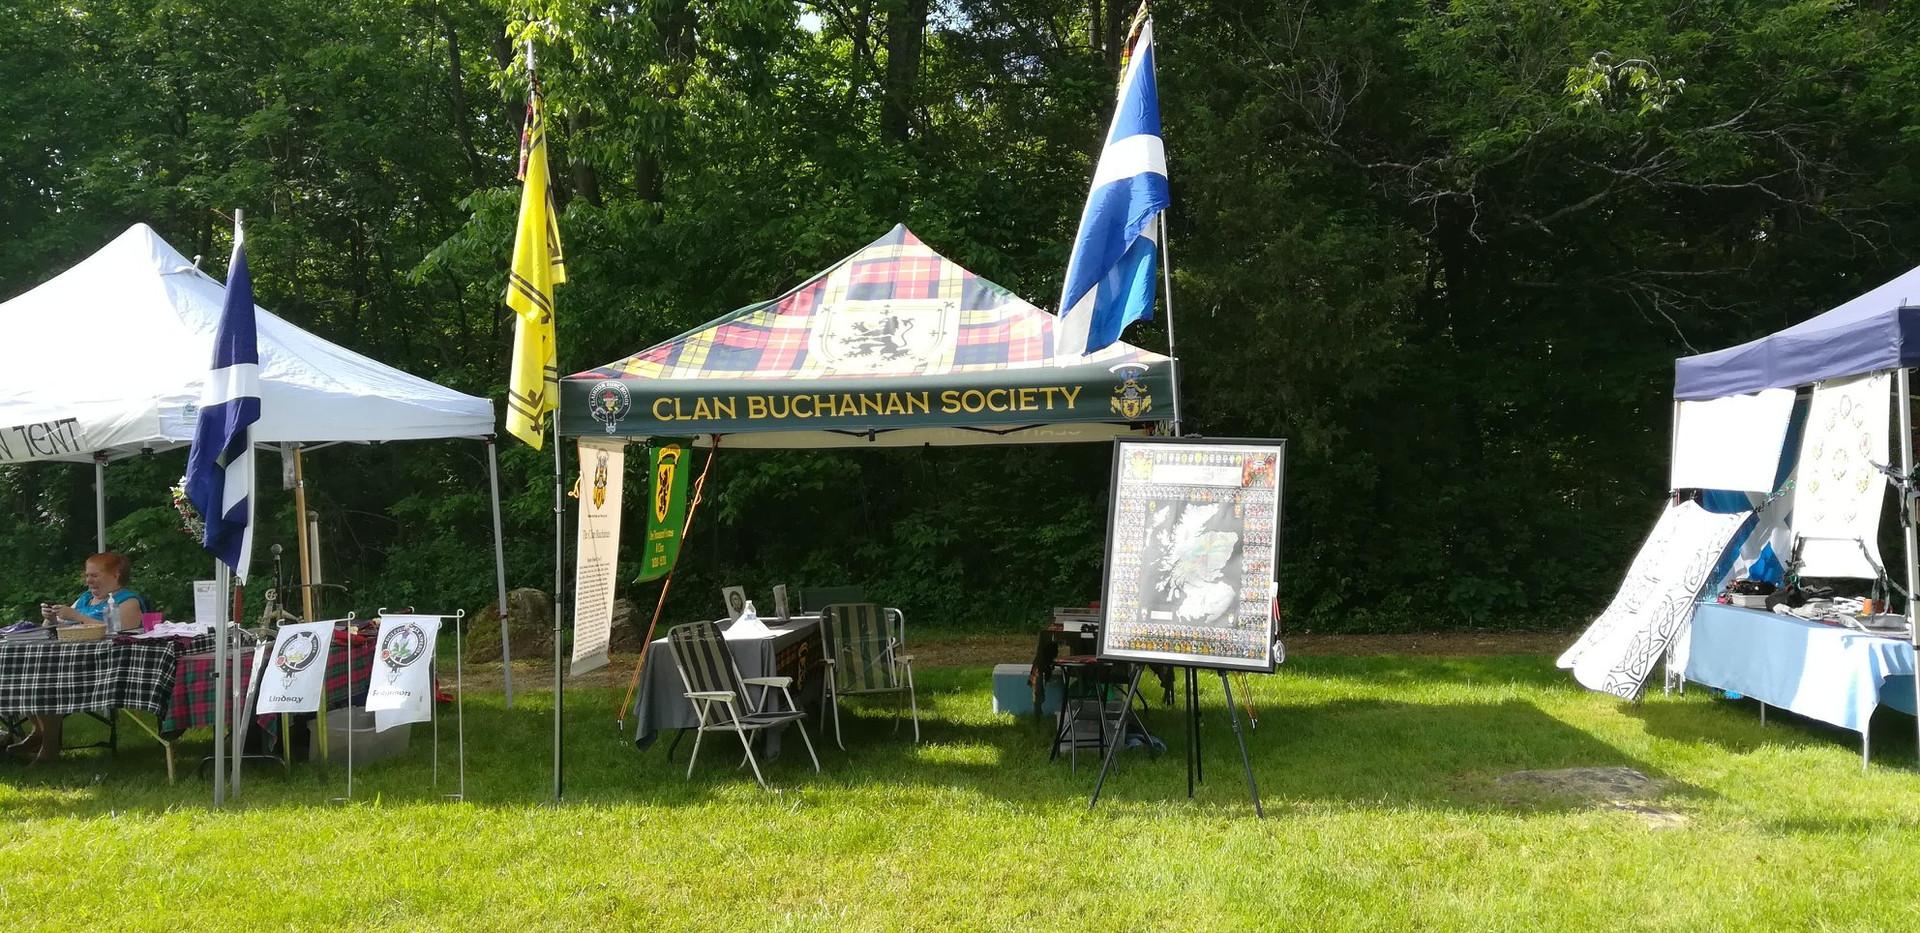 Clan Buchannan Tent